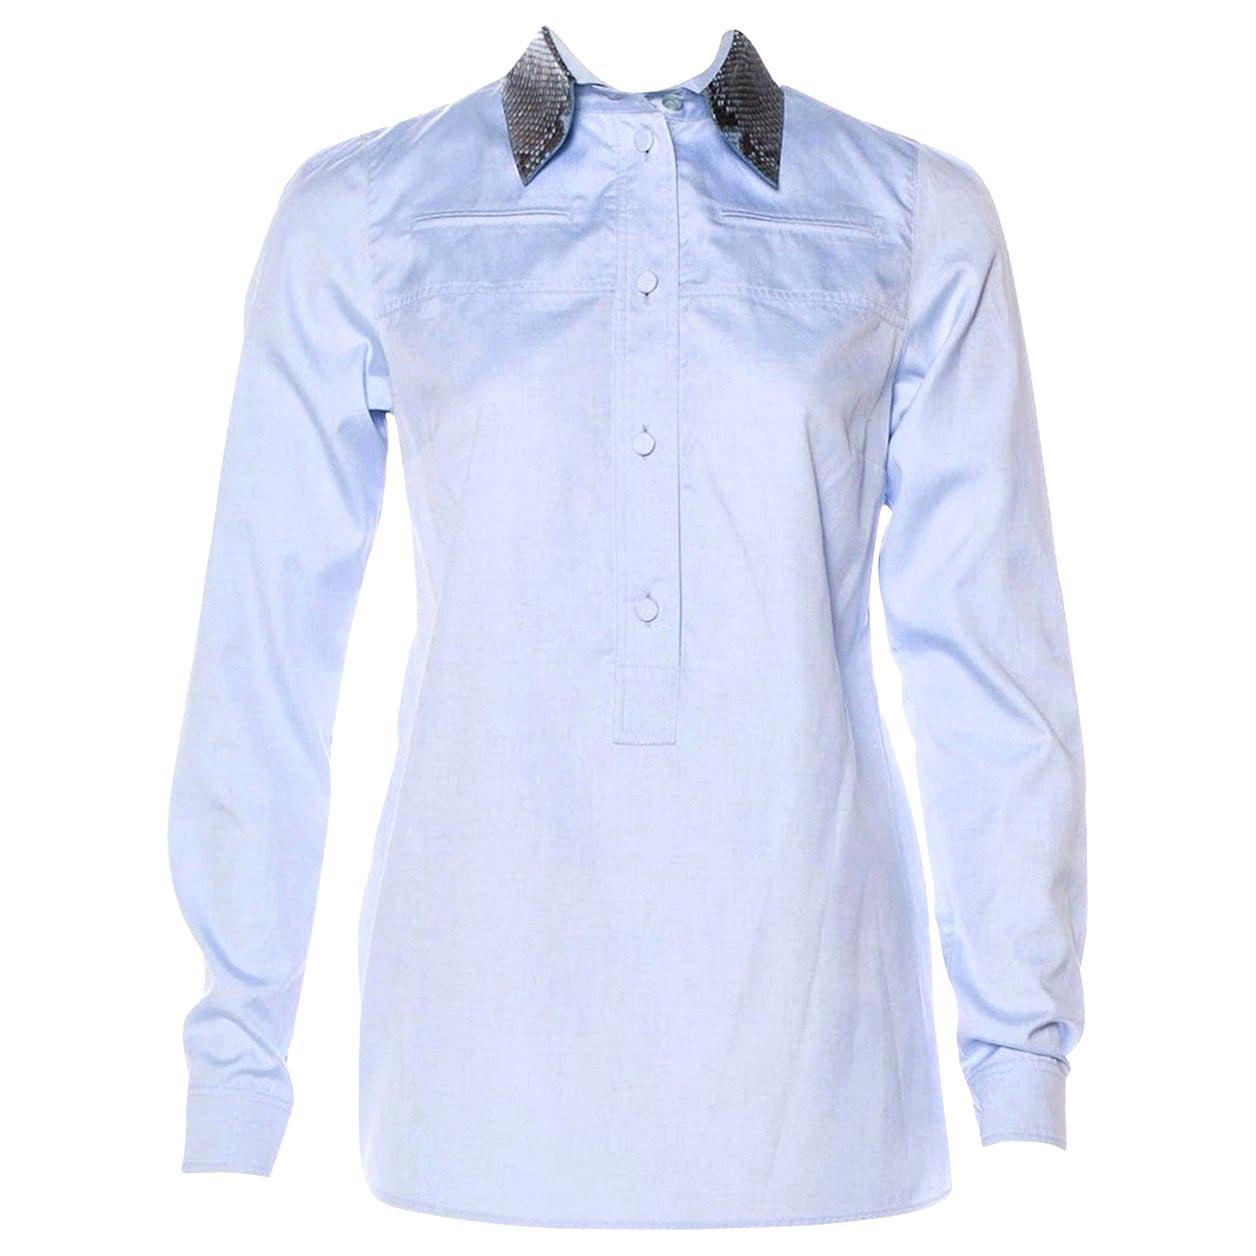 New Gucci Resort 2015 Python & Cotton Shirt Top Blouse Tunic Sz 42 $1275